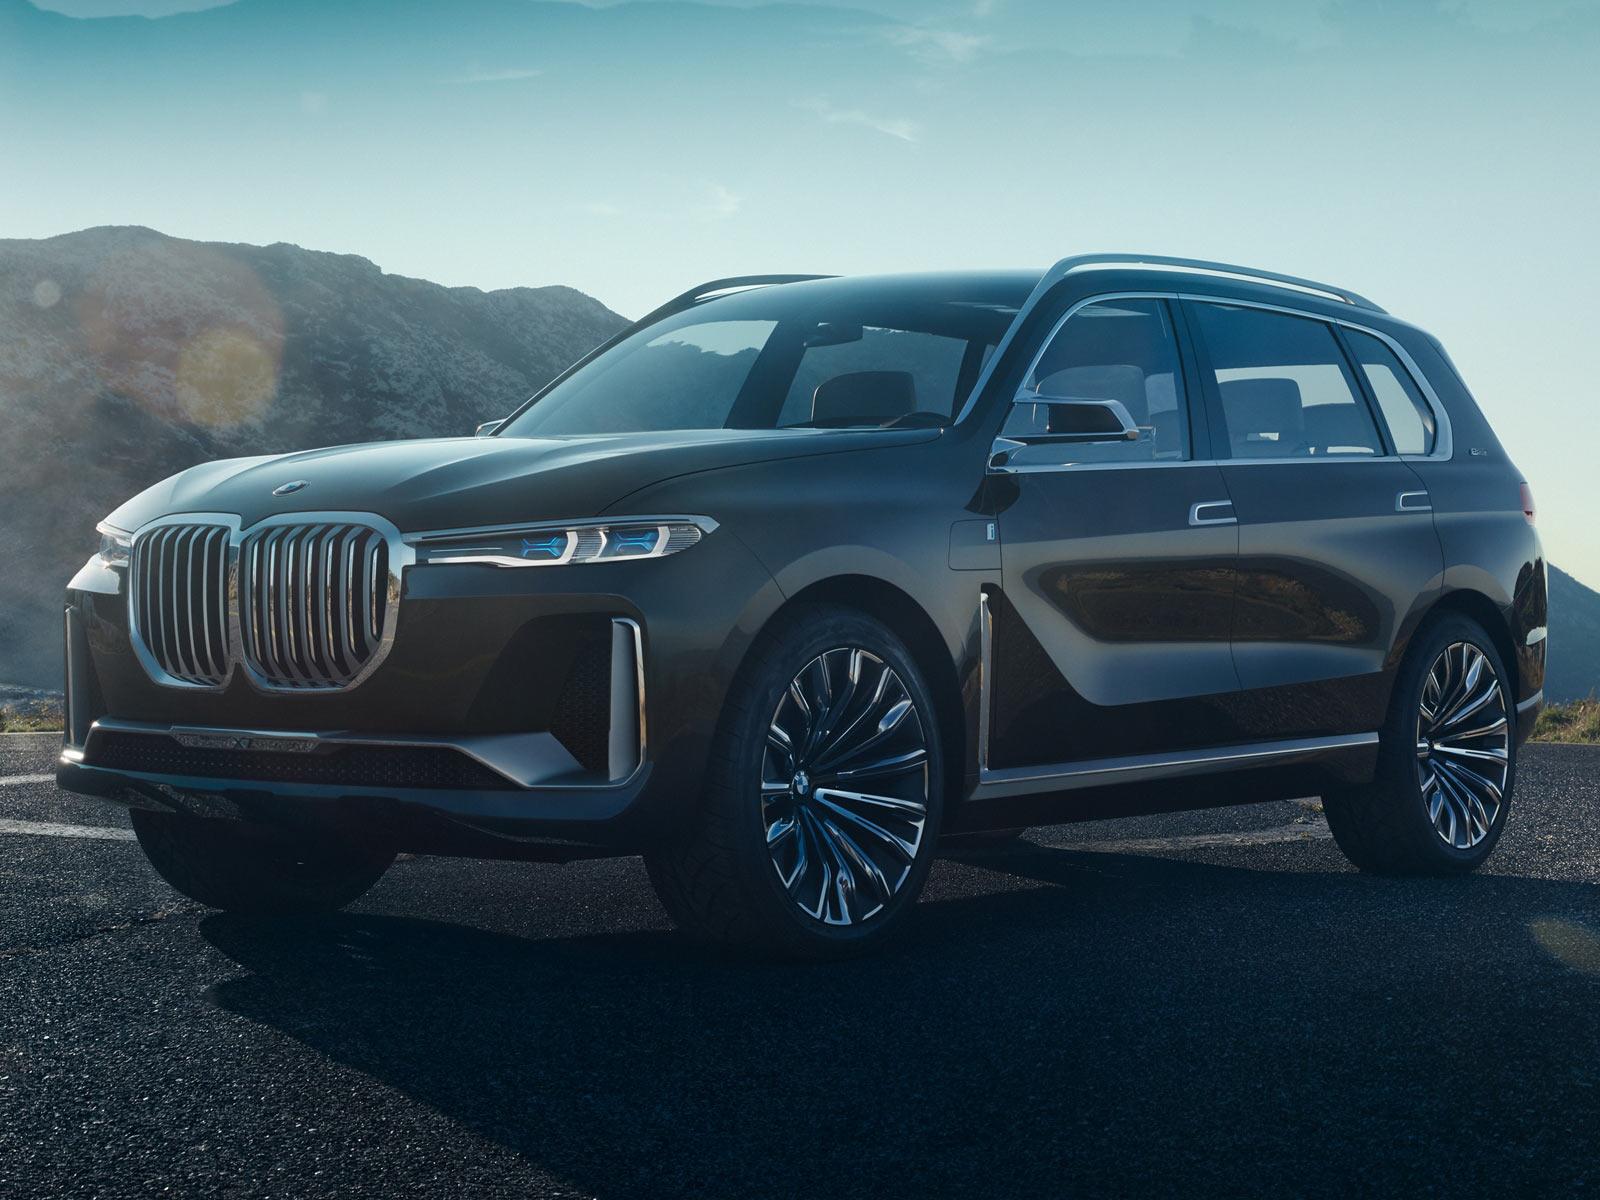 BMW-X7-Concept-2.jpg